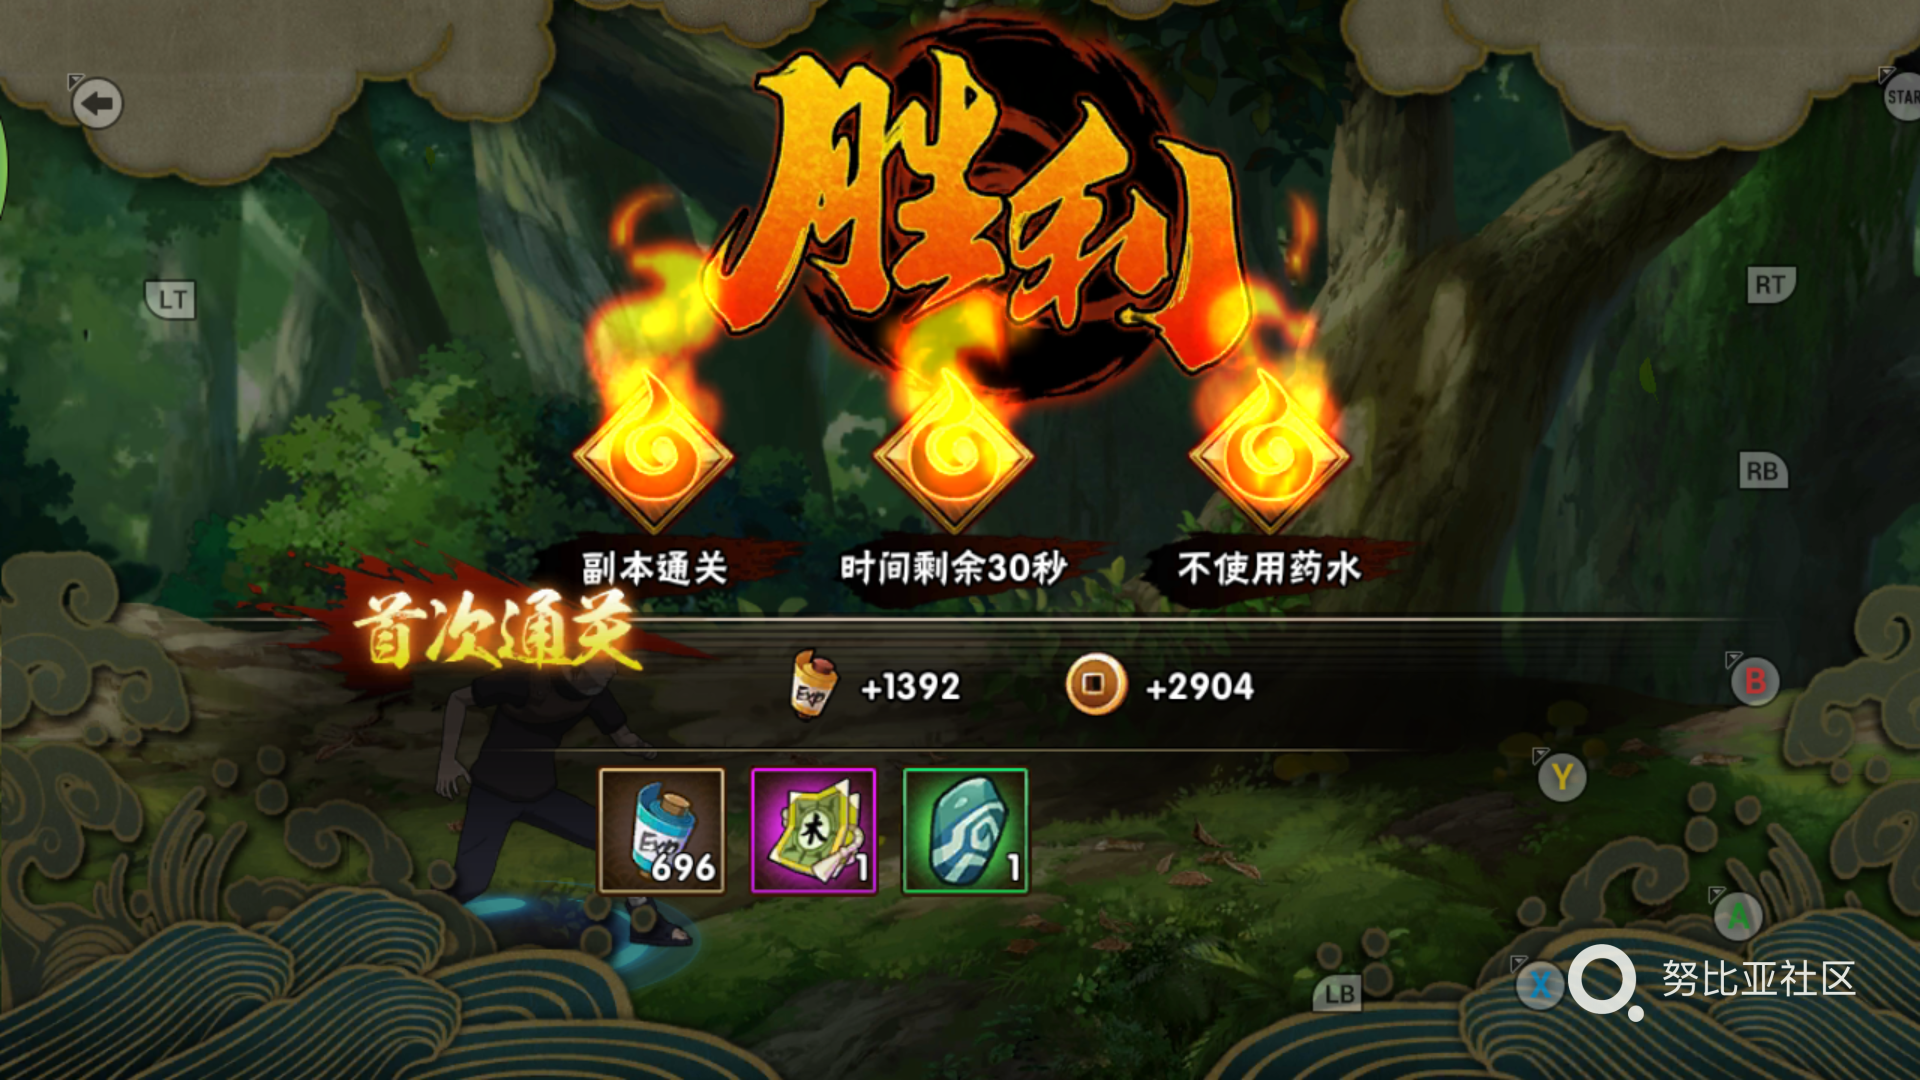 Screenshot_2018-06-18-19-24-09-849_com.tencent.KiHan.png